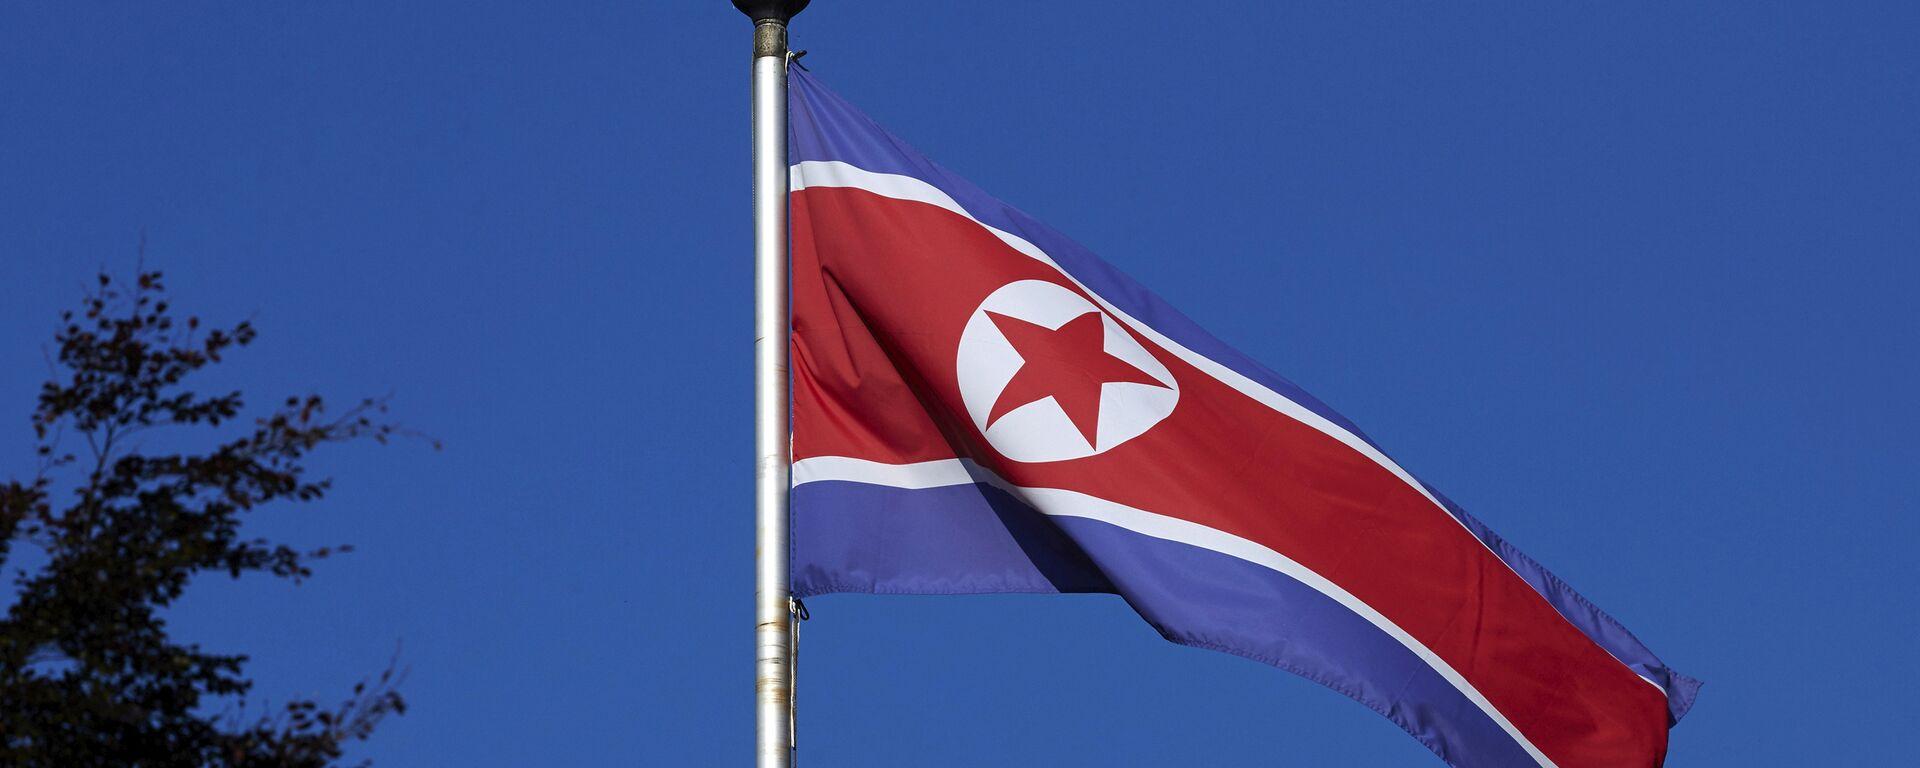 Bandera de Corea del Norte - Sputnik Mundo, 1920, 03.10.2021